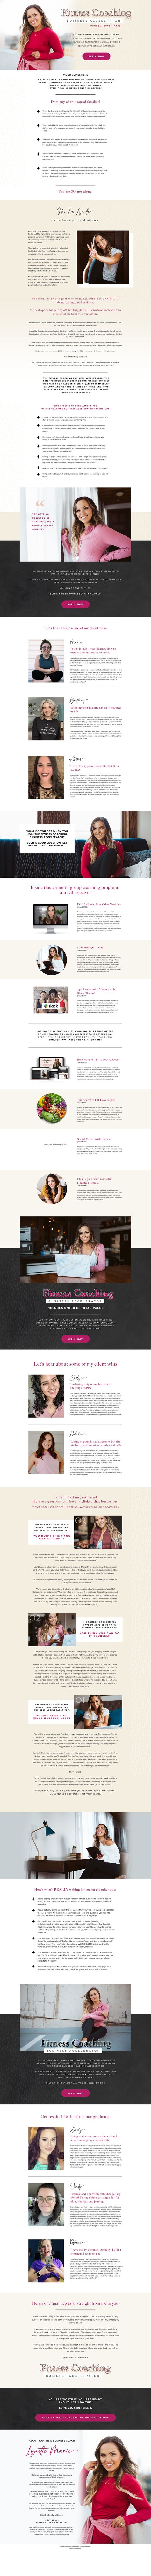 Lynette Marie FCBA Sales Page